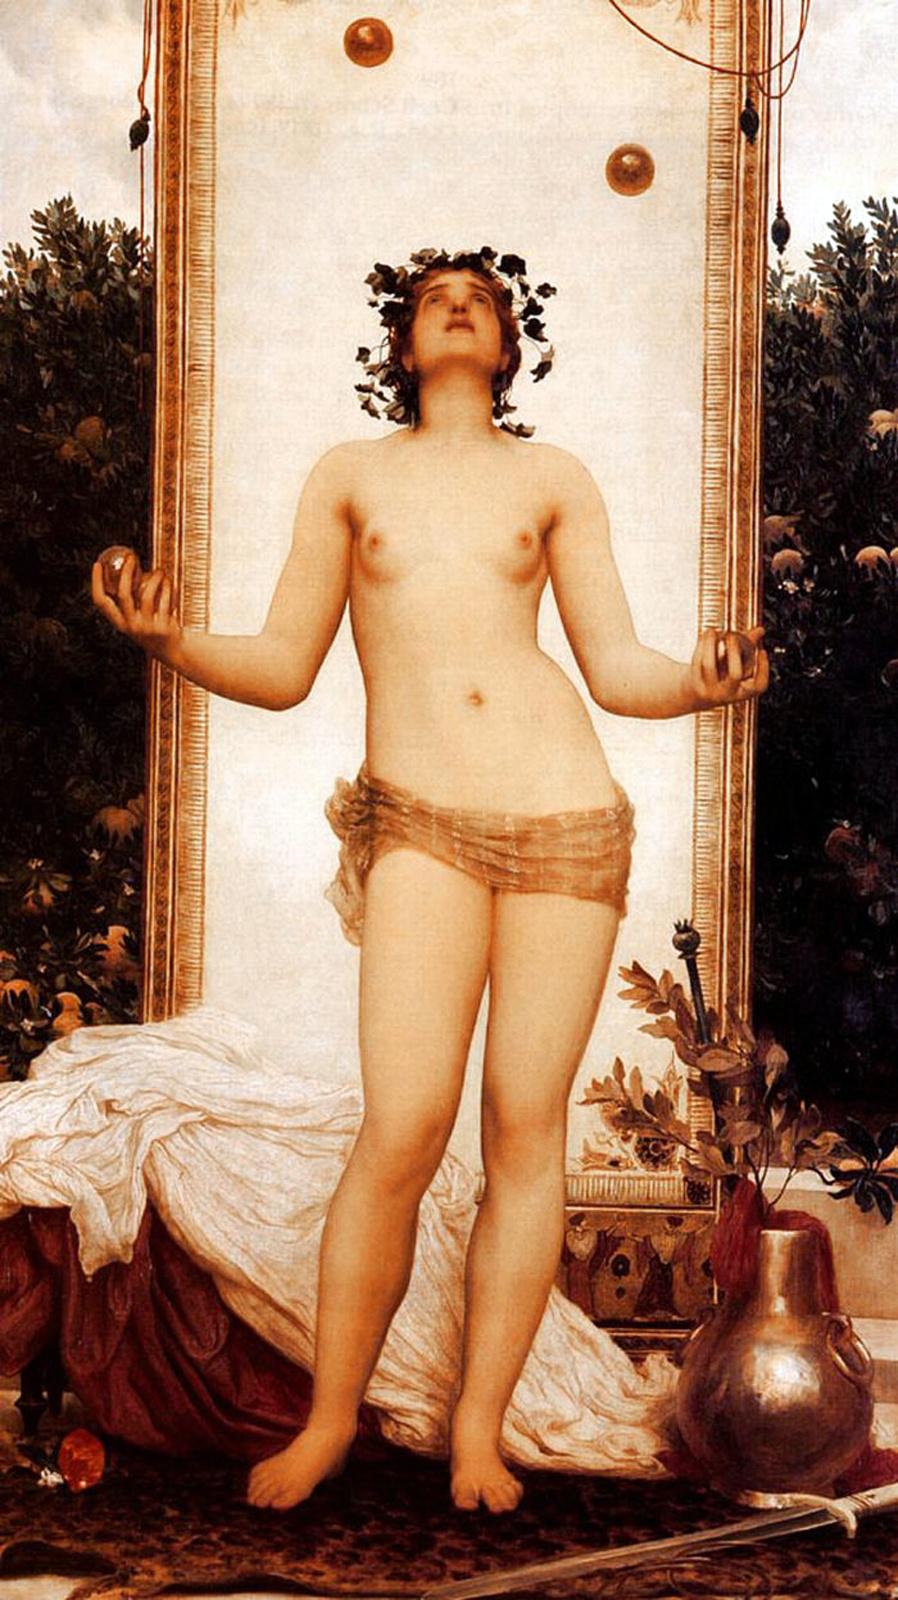 Frederic Leighton. Antique Juggling Girl